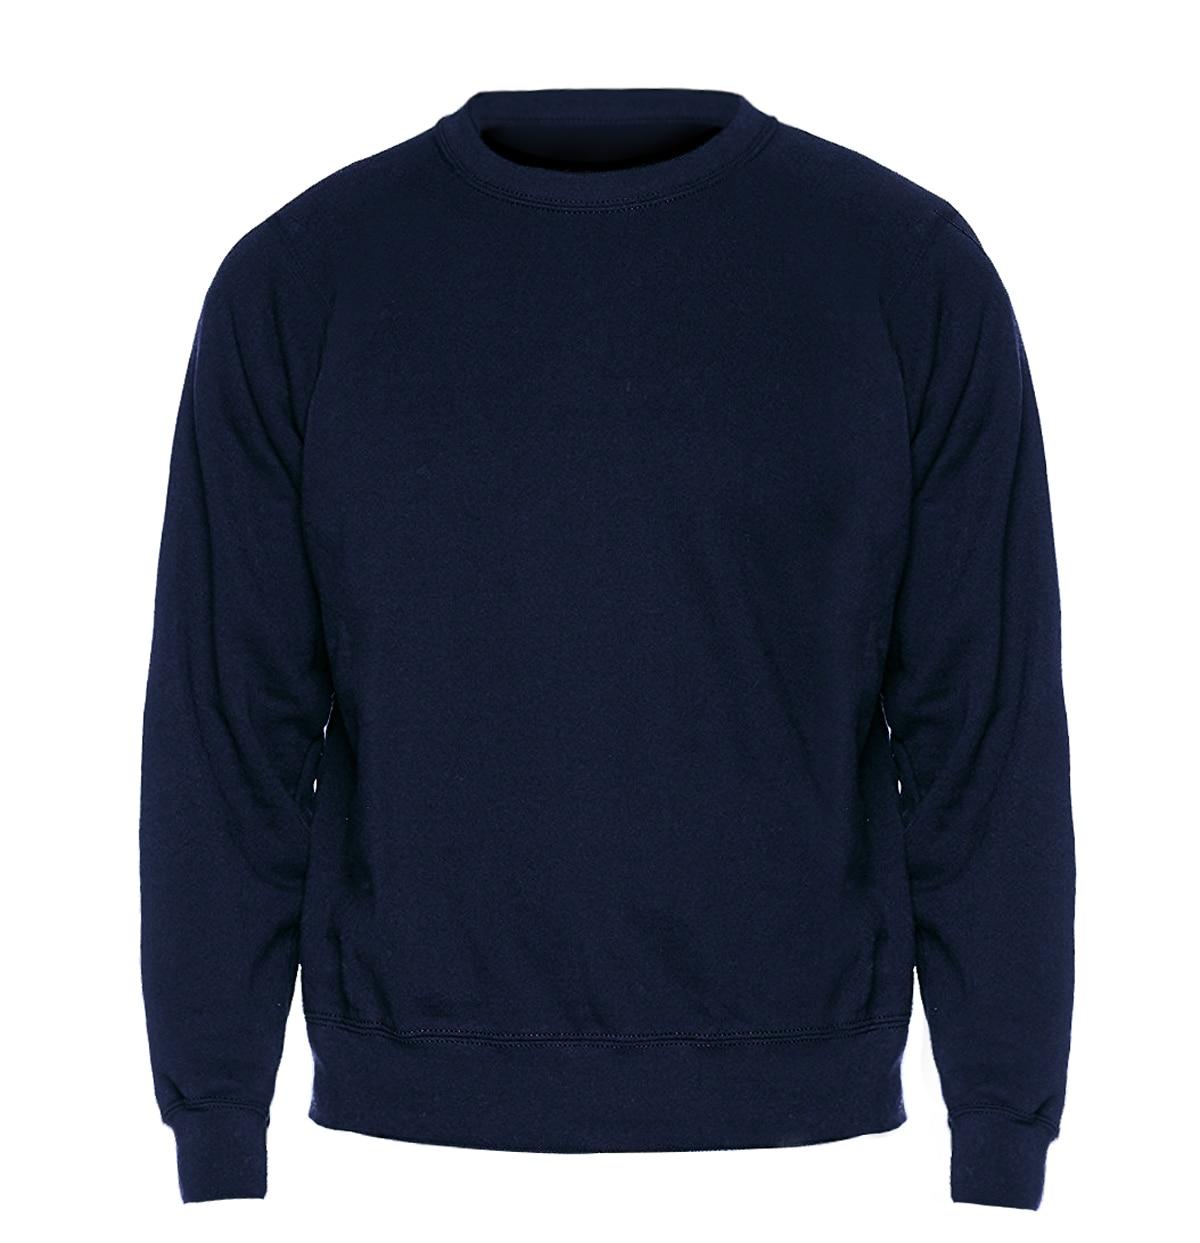 Solid color Sweatshirt Men Hoodie Crewneck Sweatshirts Winter Autumn Fleece Hoody Casual Gray Blue Red Black White Streetwear 21